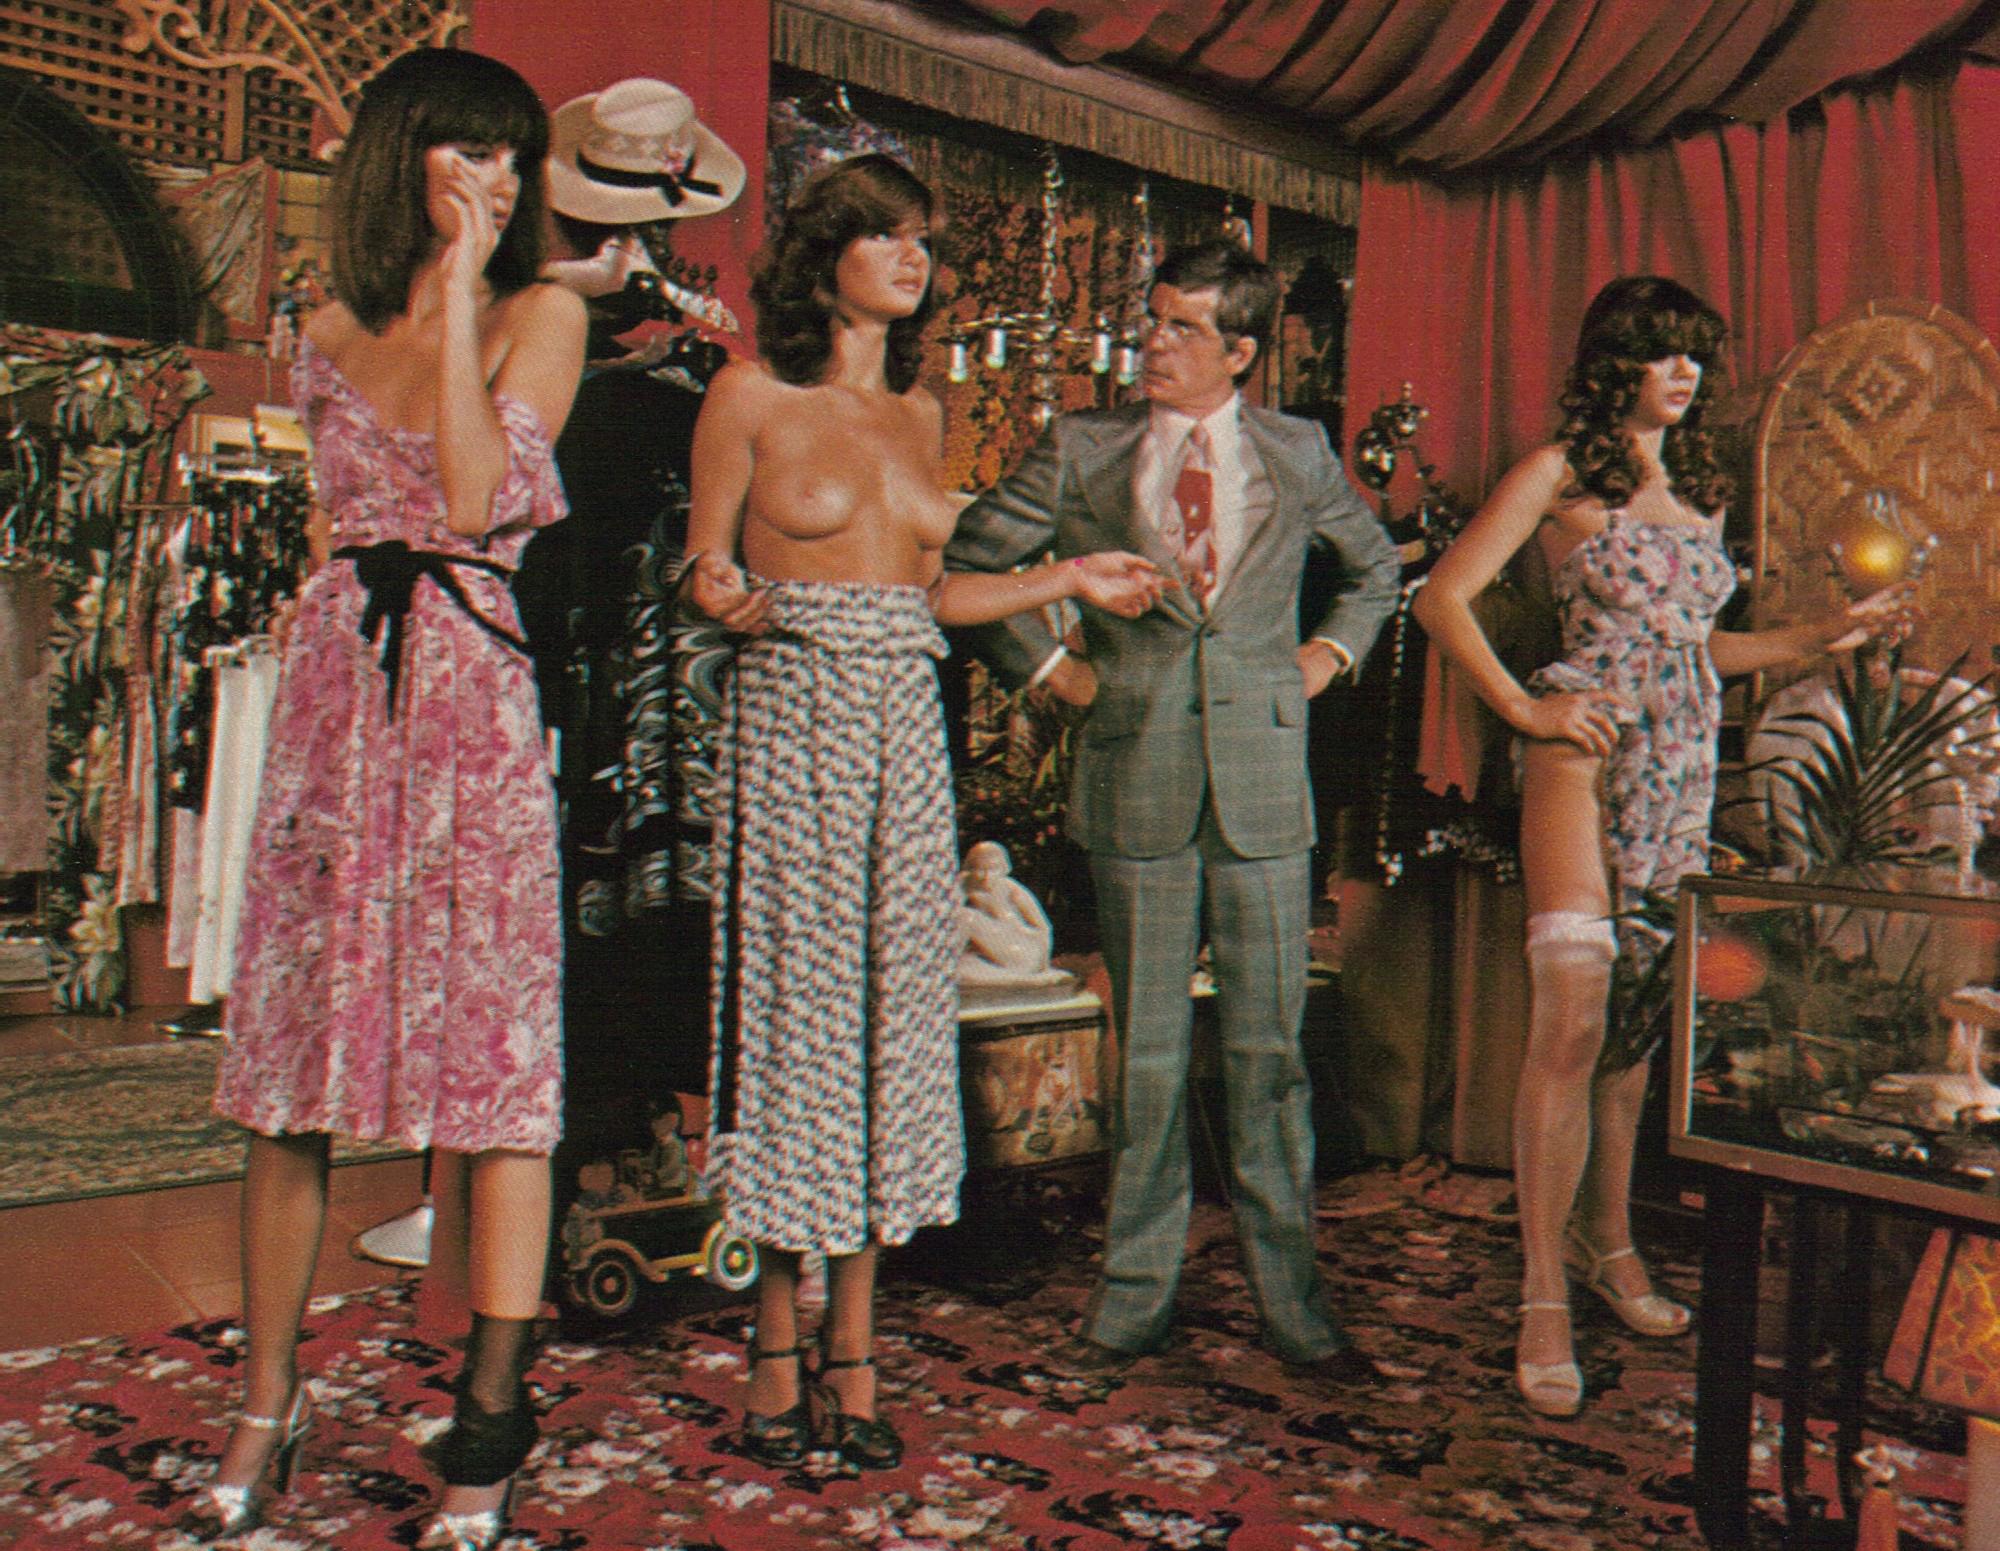 02 Living Dolls Penthouse Magazine April 1978 .jpg